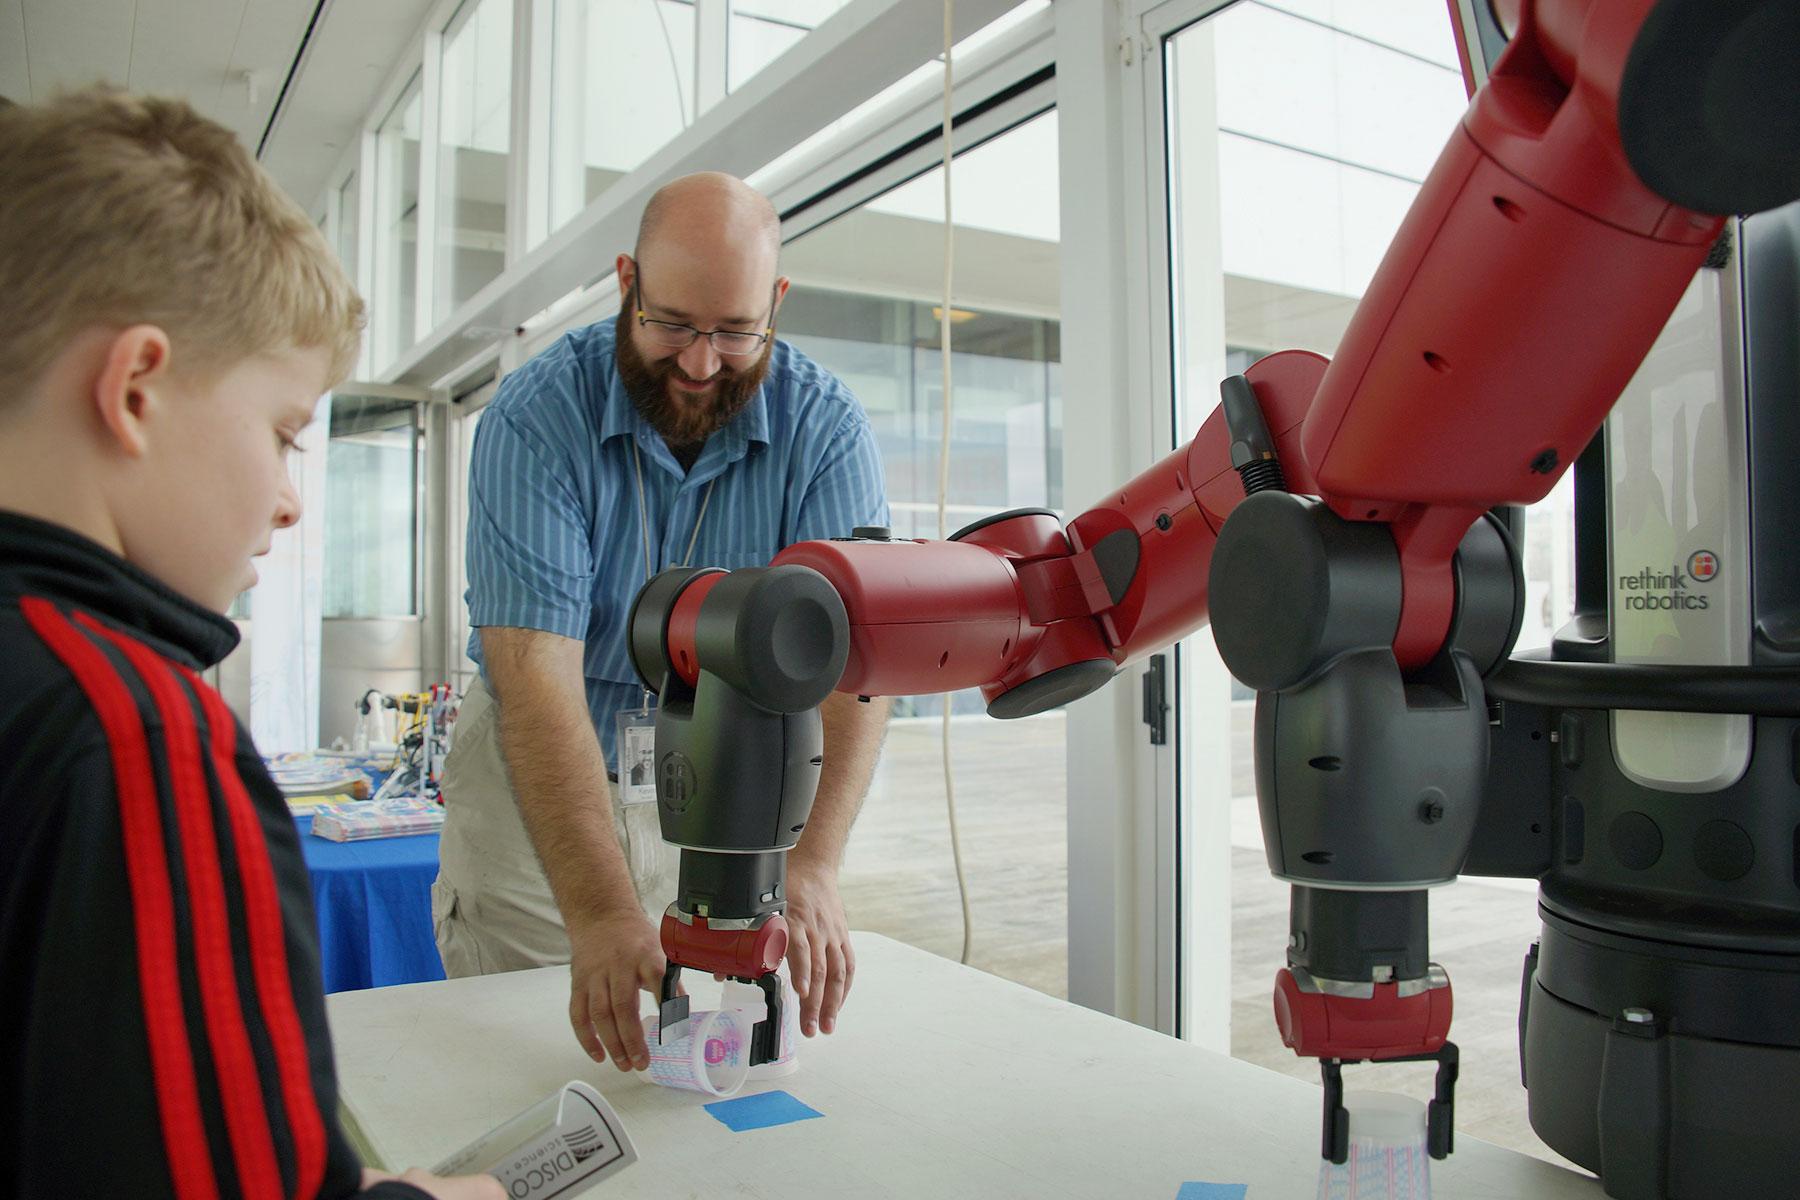 032816_Robotics_017